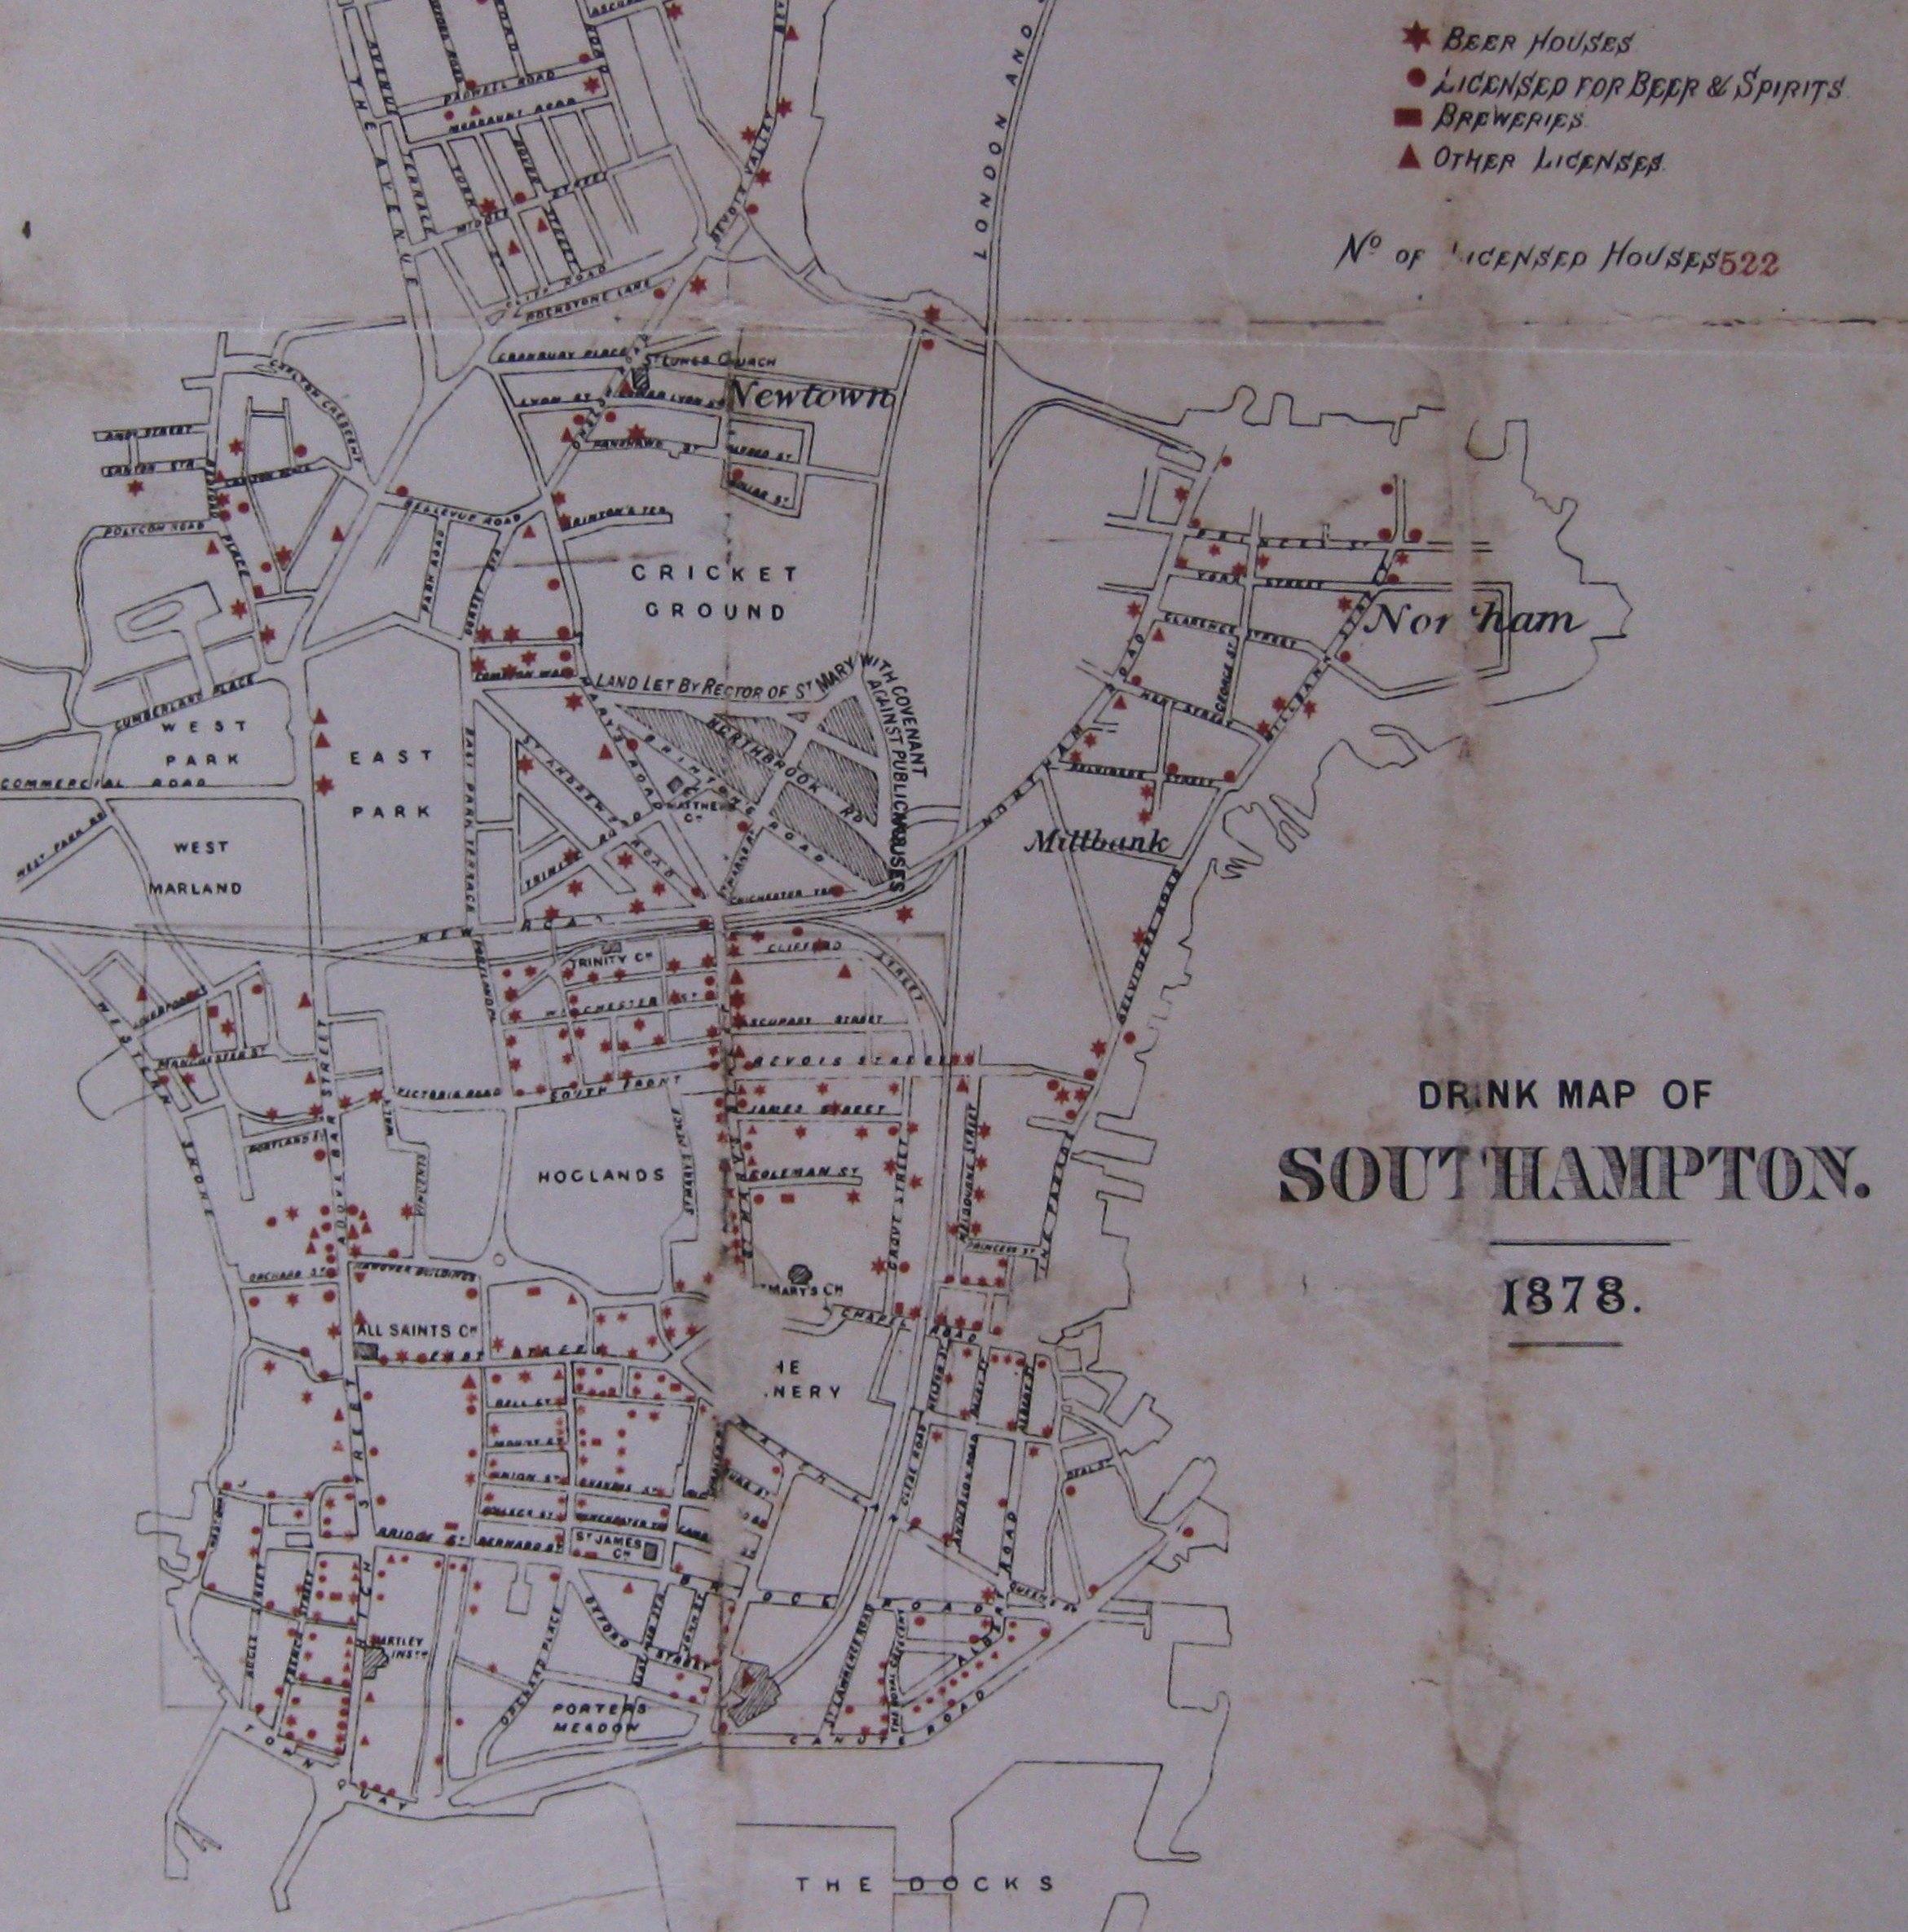 Drink Map of Southampton, 1878